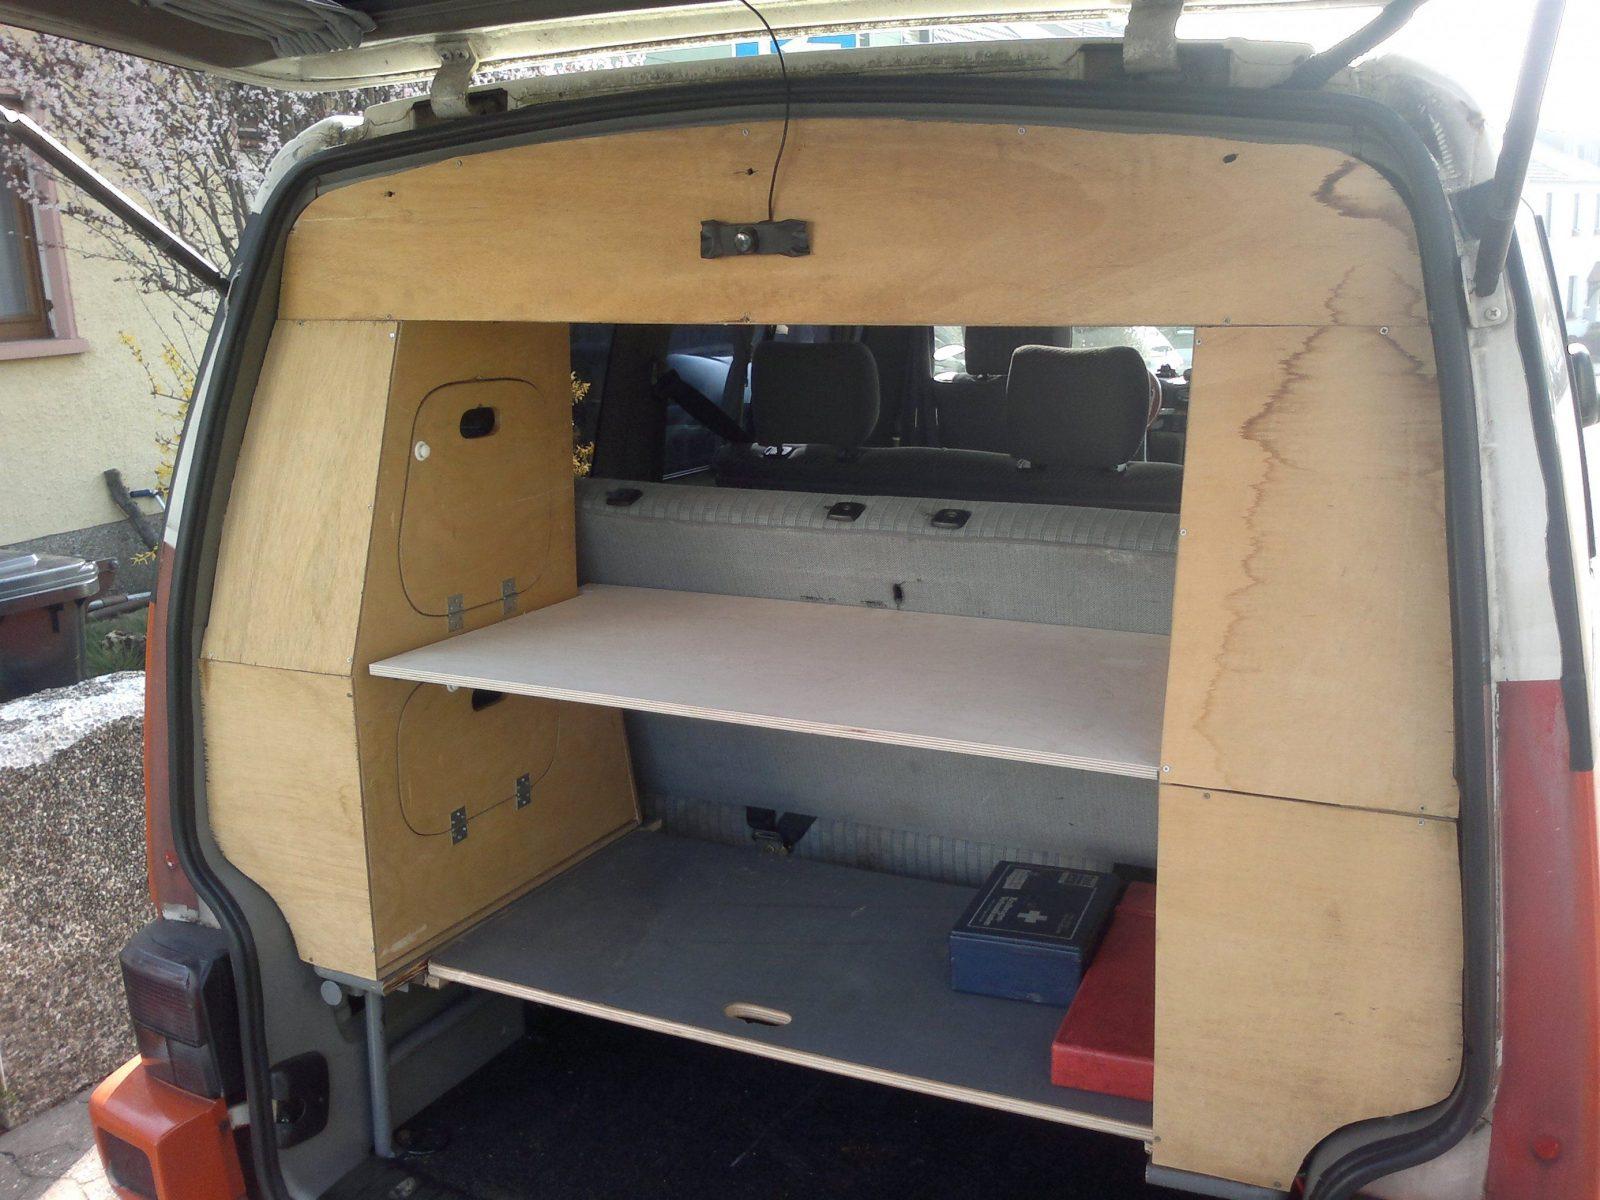 Camping Küchenblock Selber Bauen Kochkor Info Avec Wohnmobil Bett von Camping Möbel Selber Bauen Bild